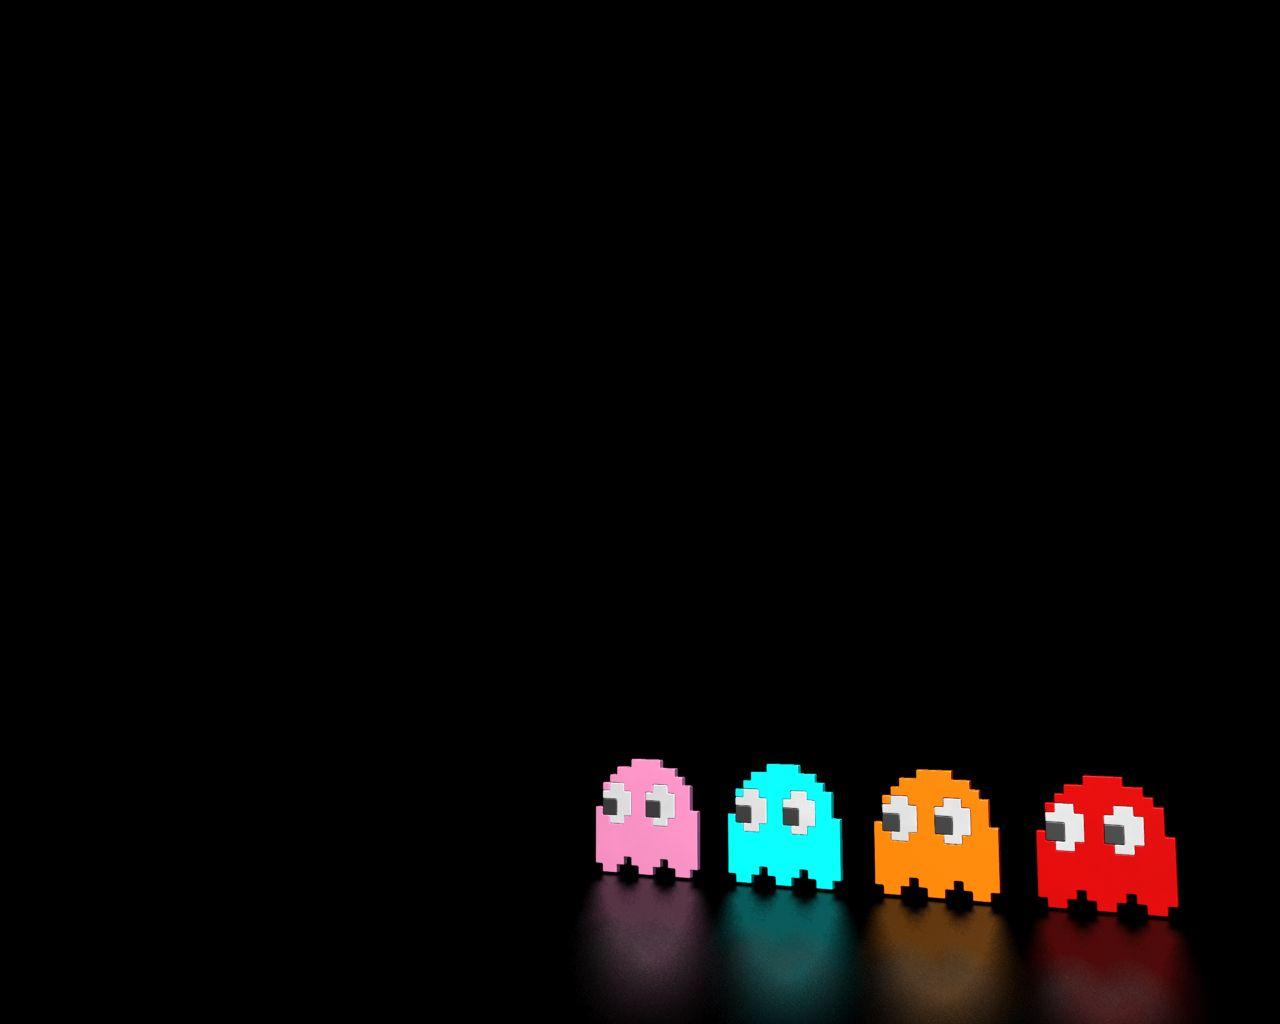 Pacman Iphone 6 Wallpaper Hd: Pacman Ghost Wallpaper Background Pink Blue Orange Red